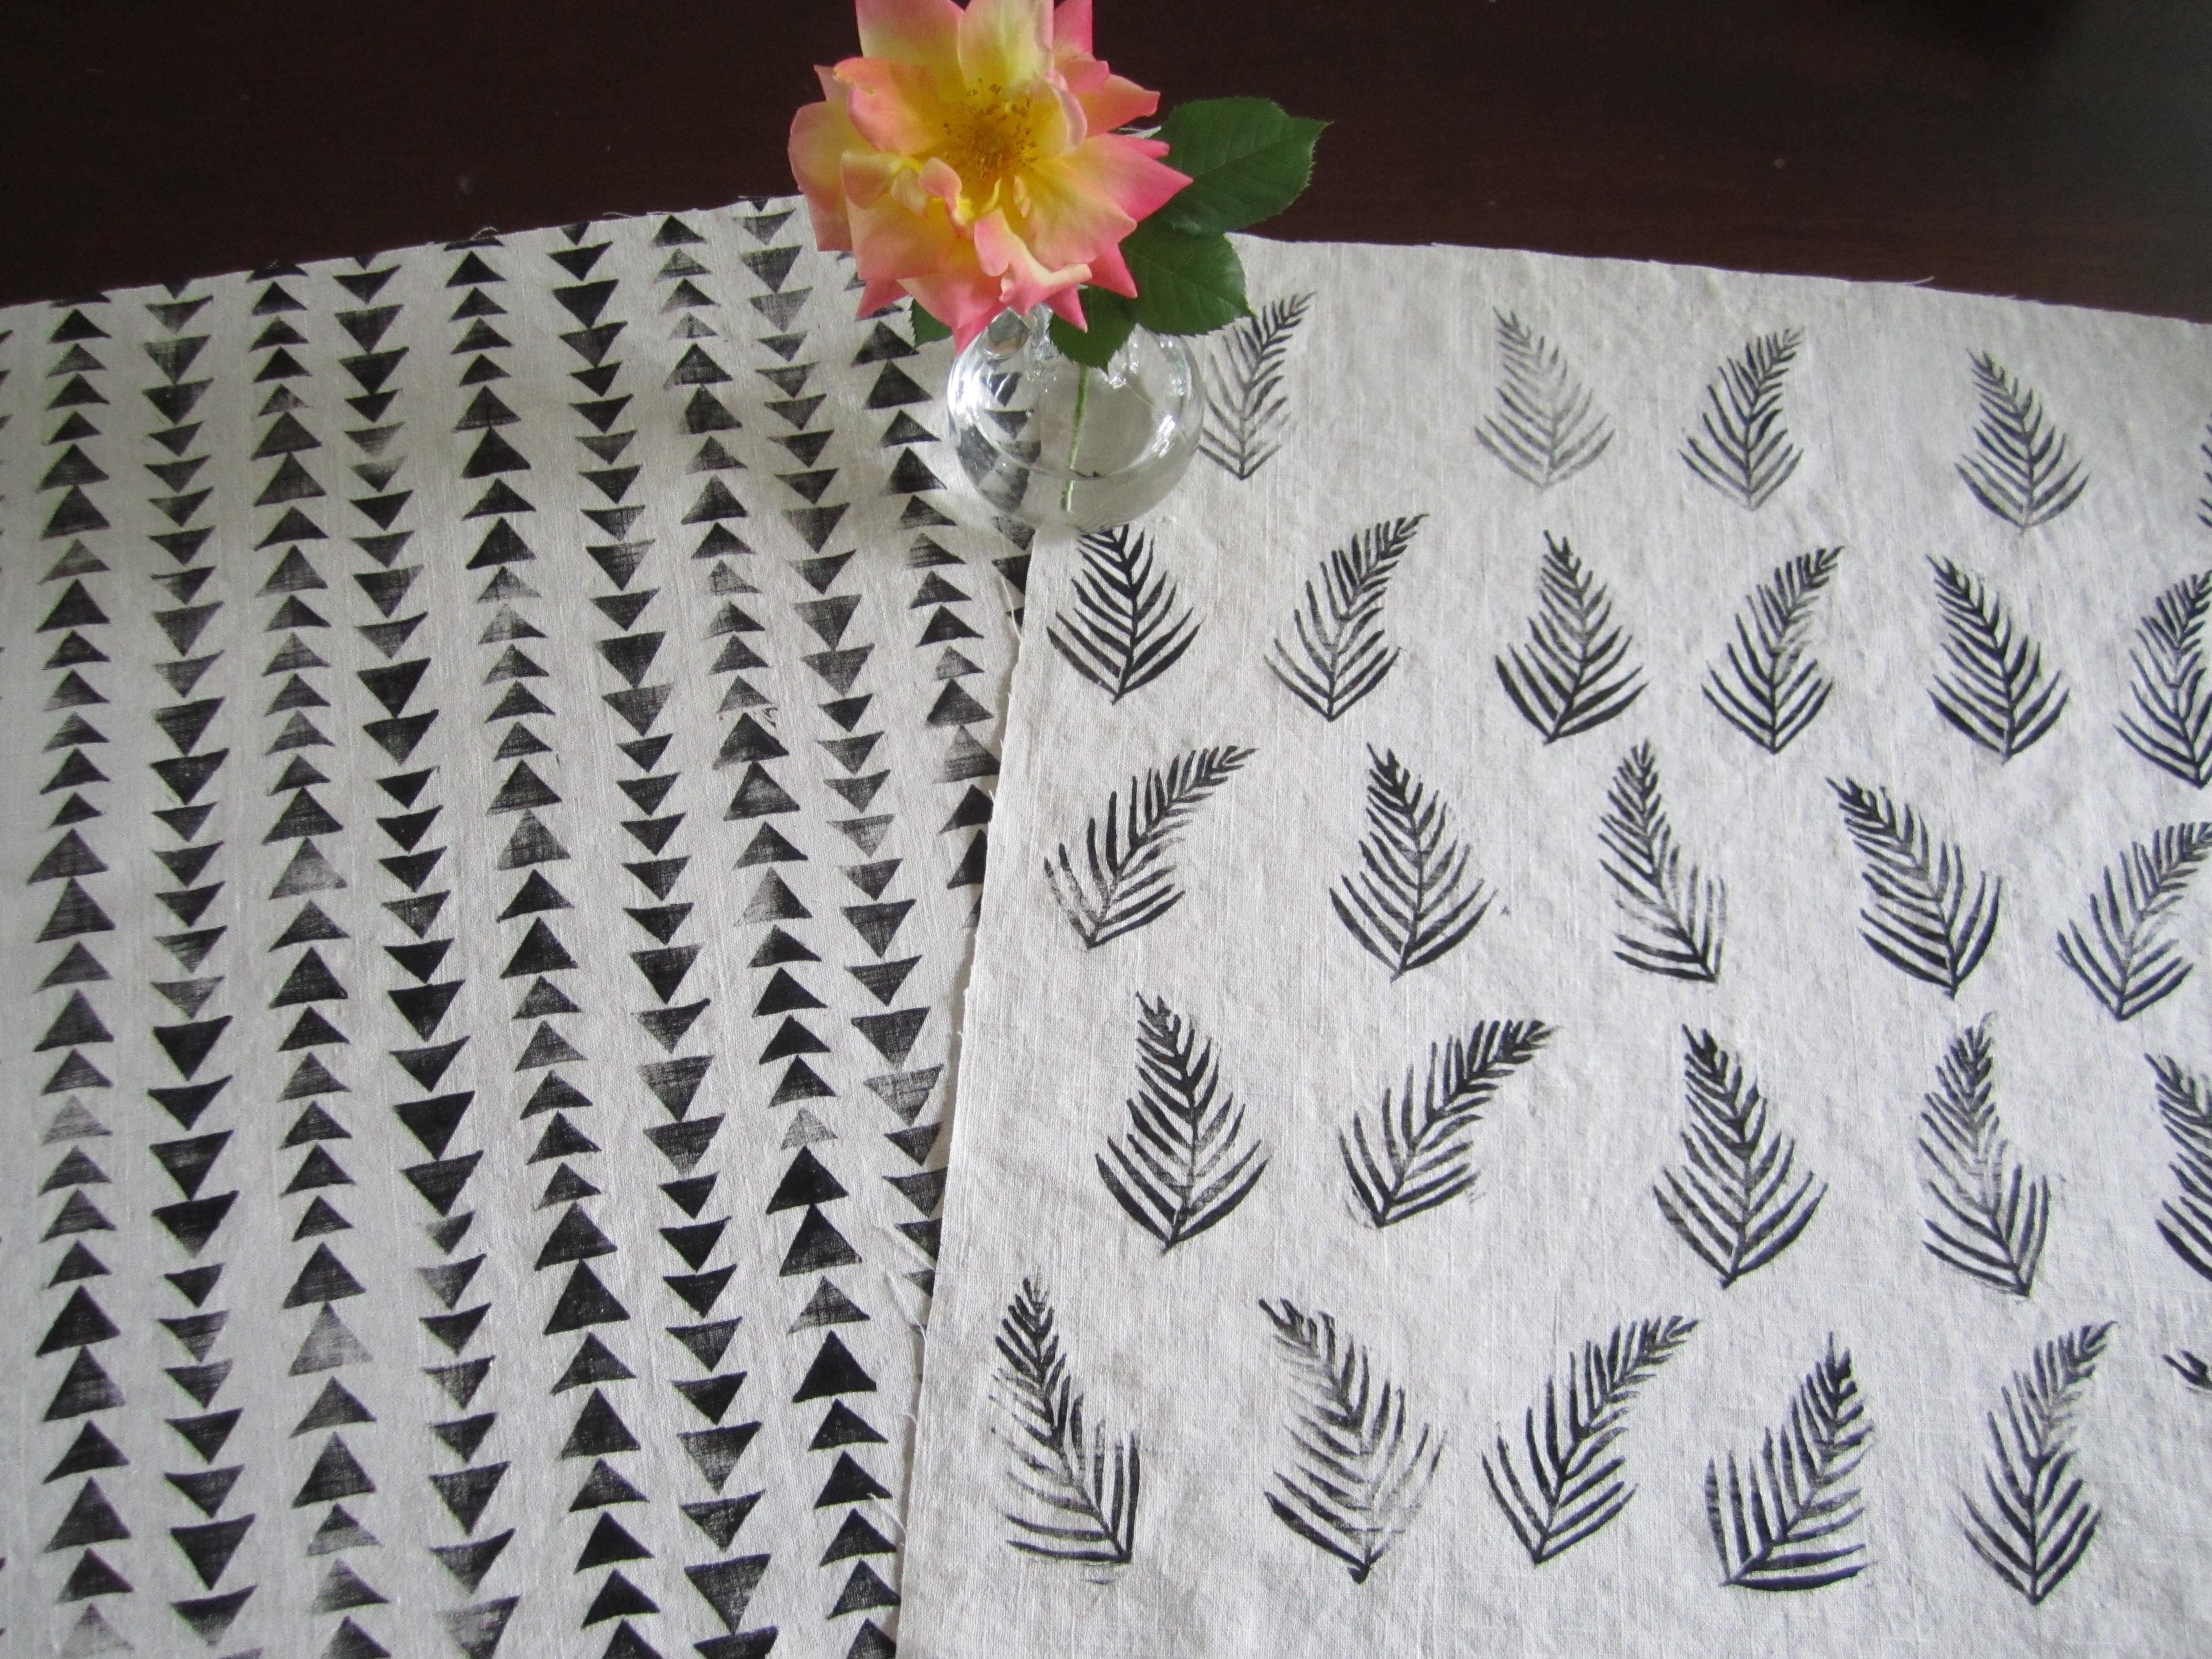 fabric printed